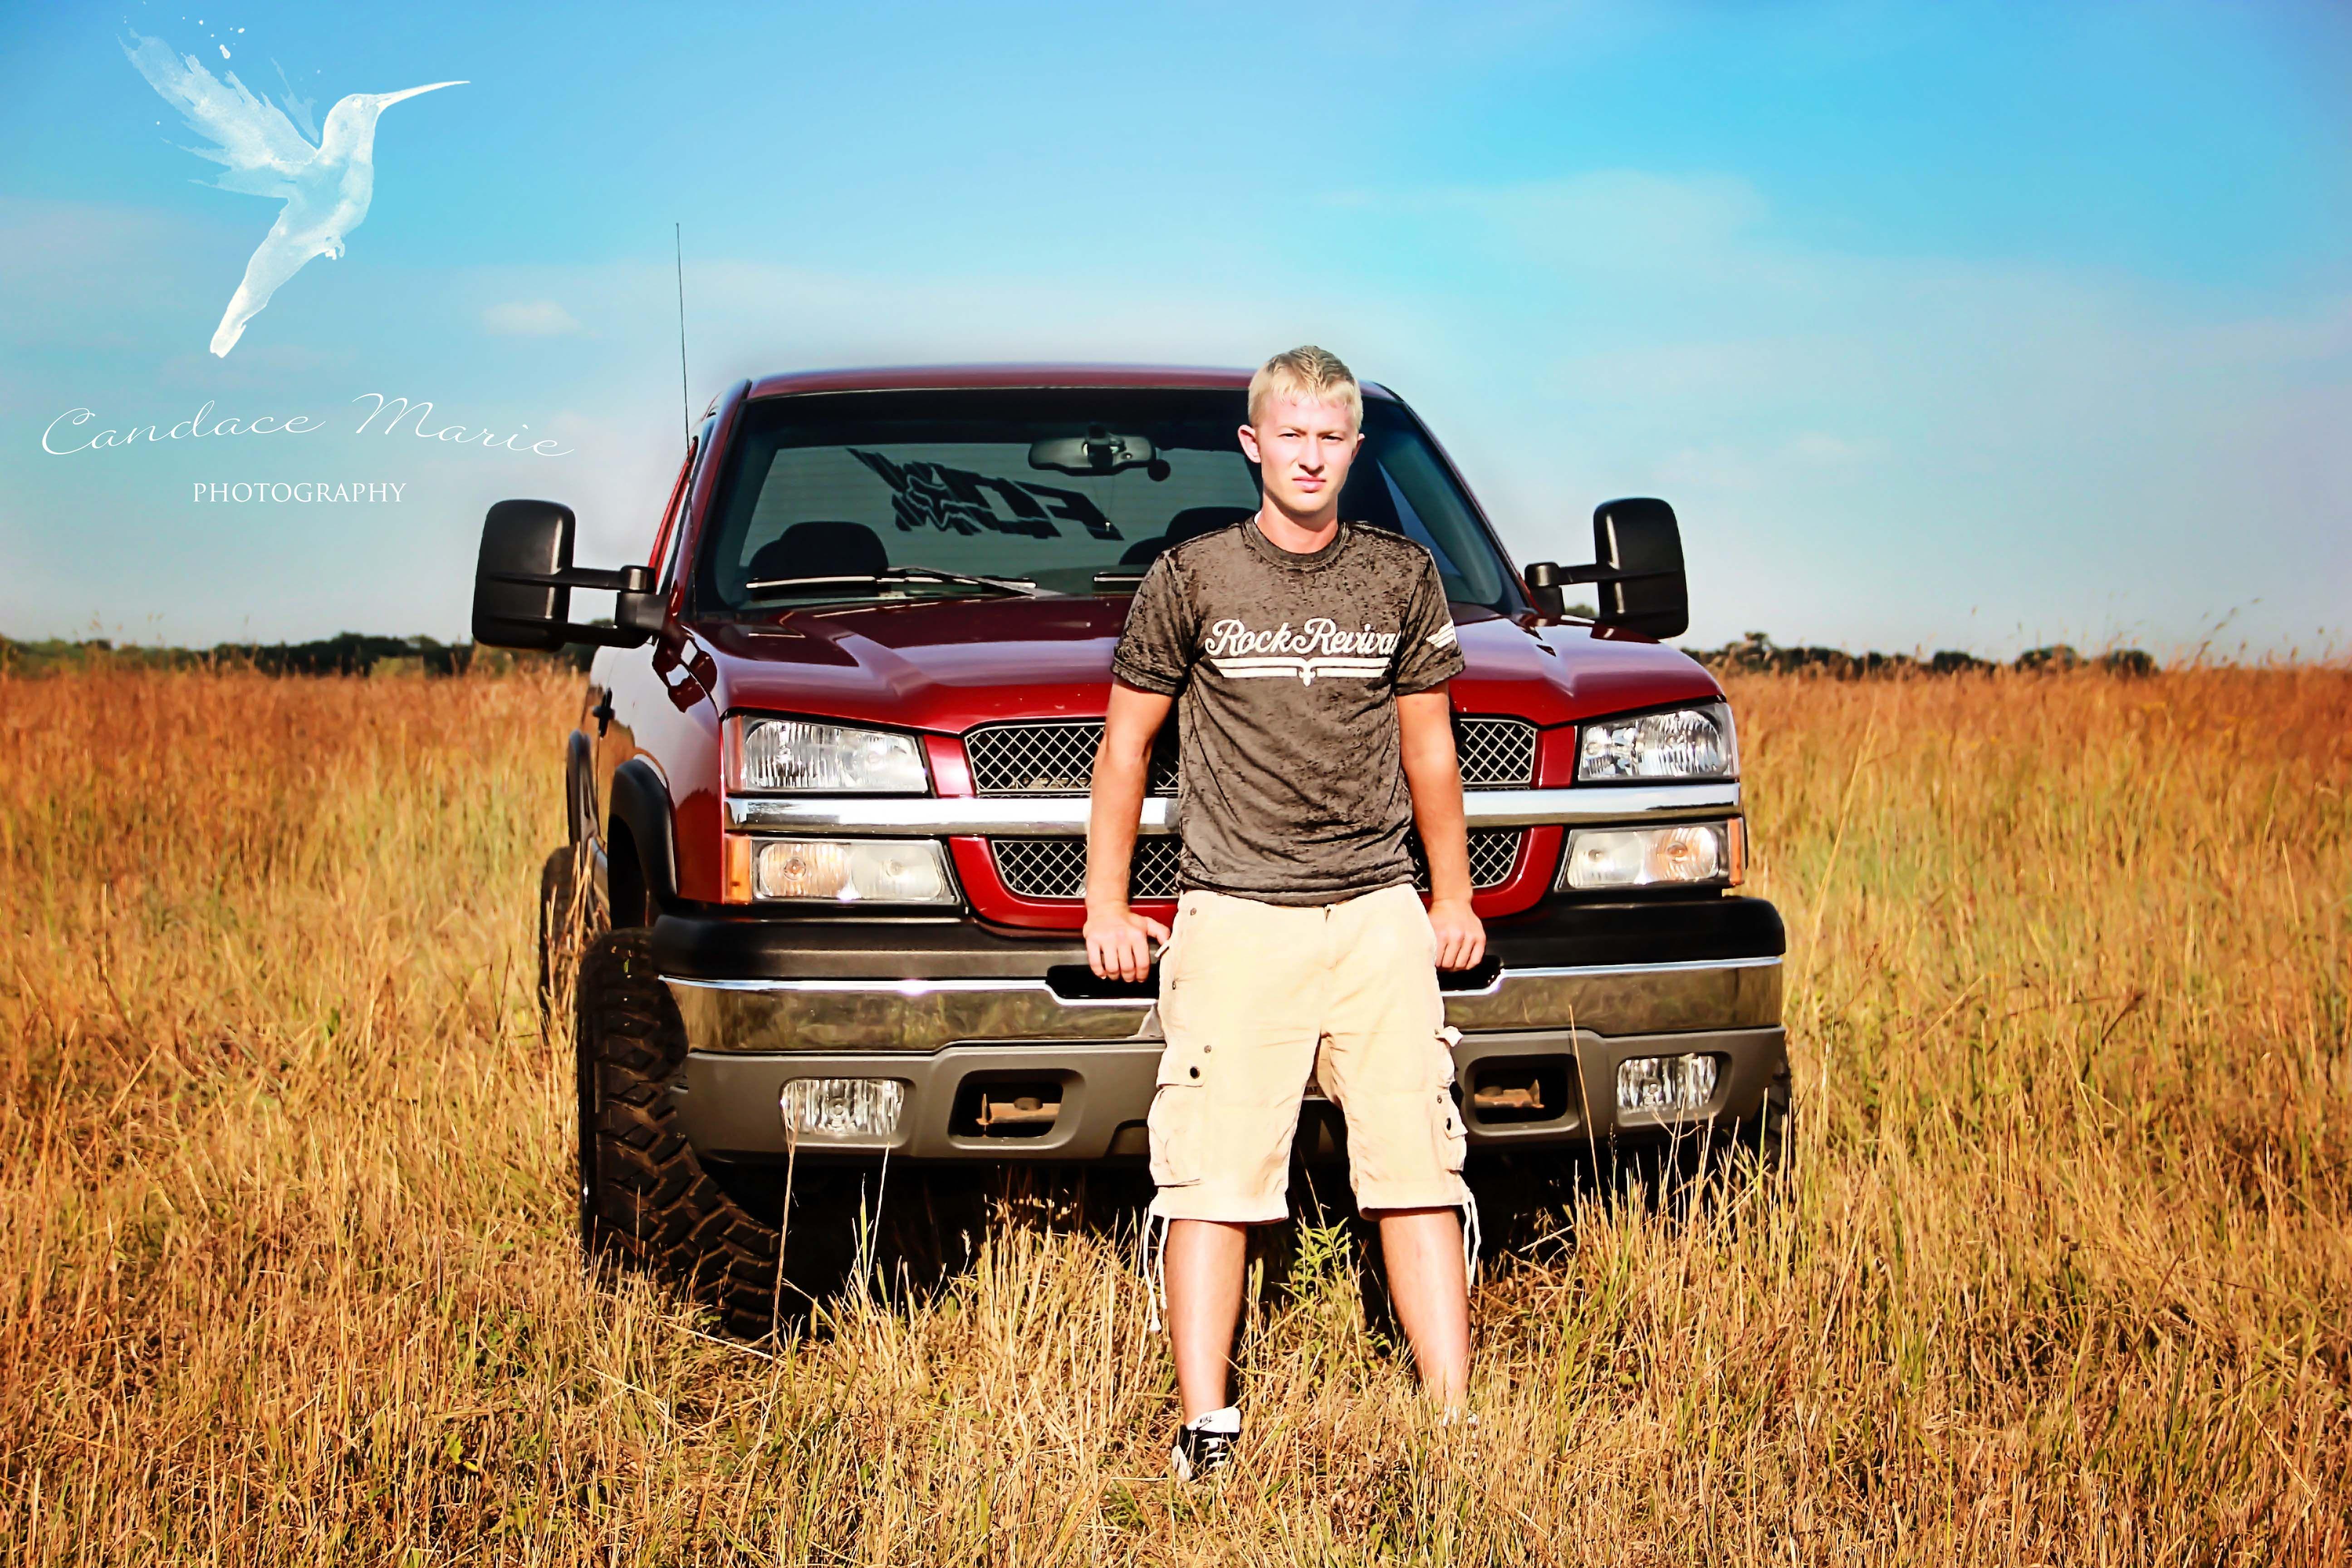 Senior guy photography, truck | Photography Ideas | Pinterest: pinterest.com/pin/212584044884419947